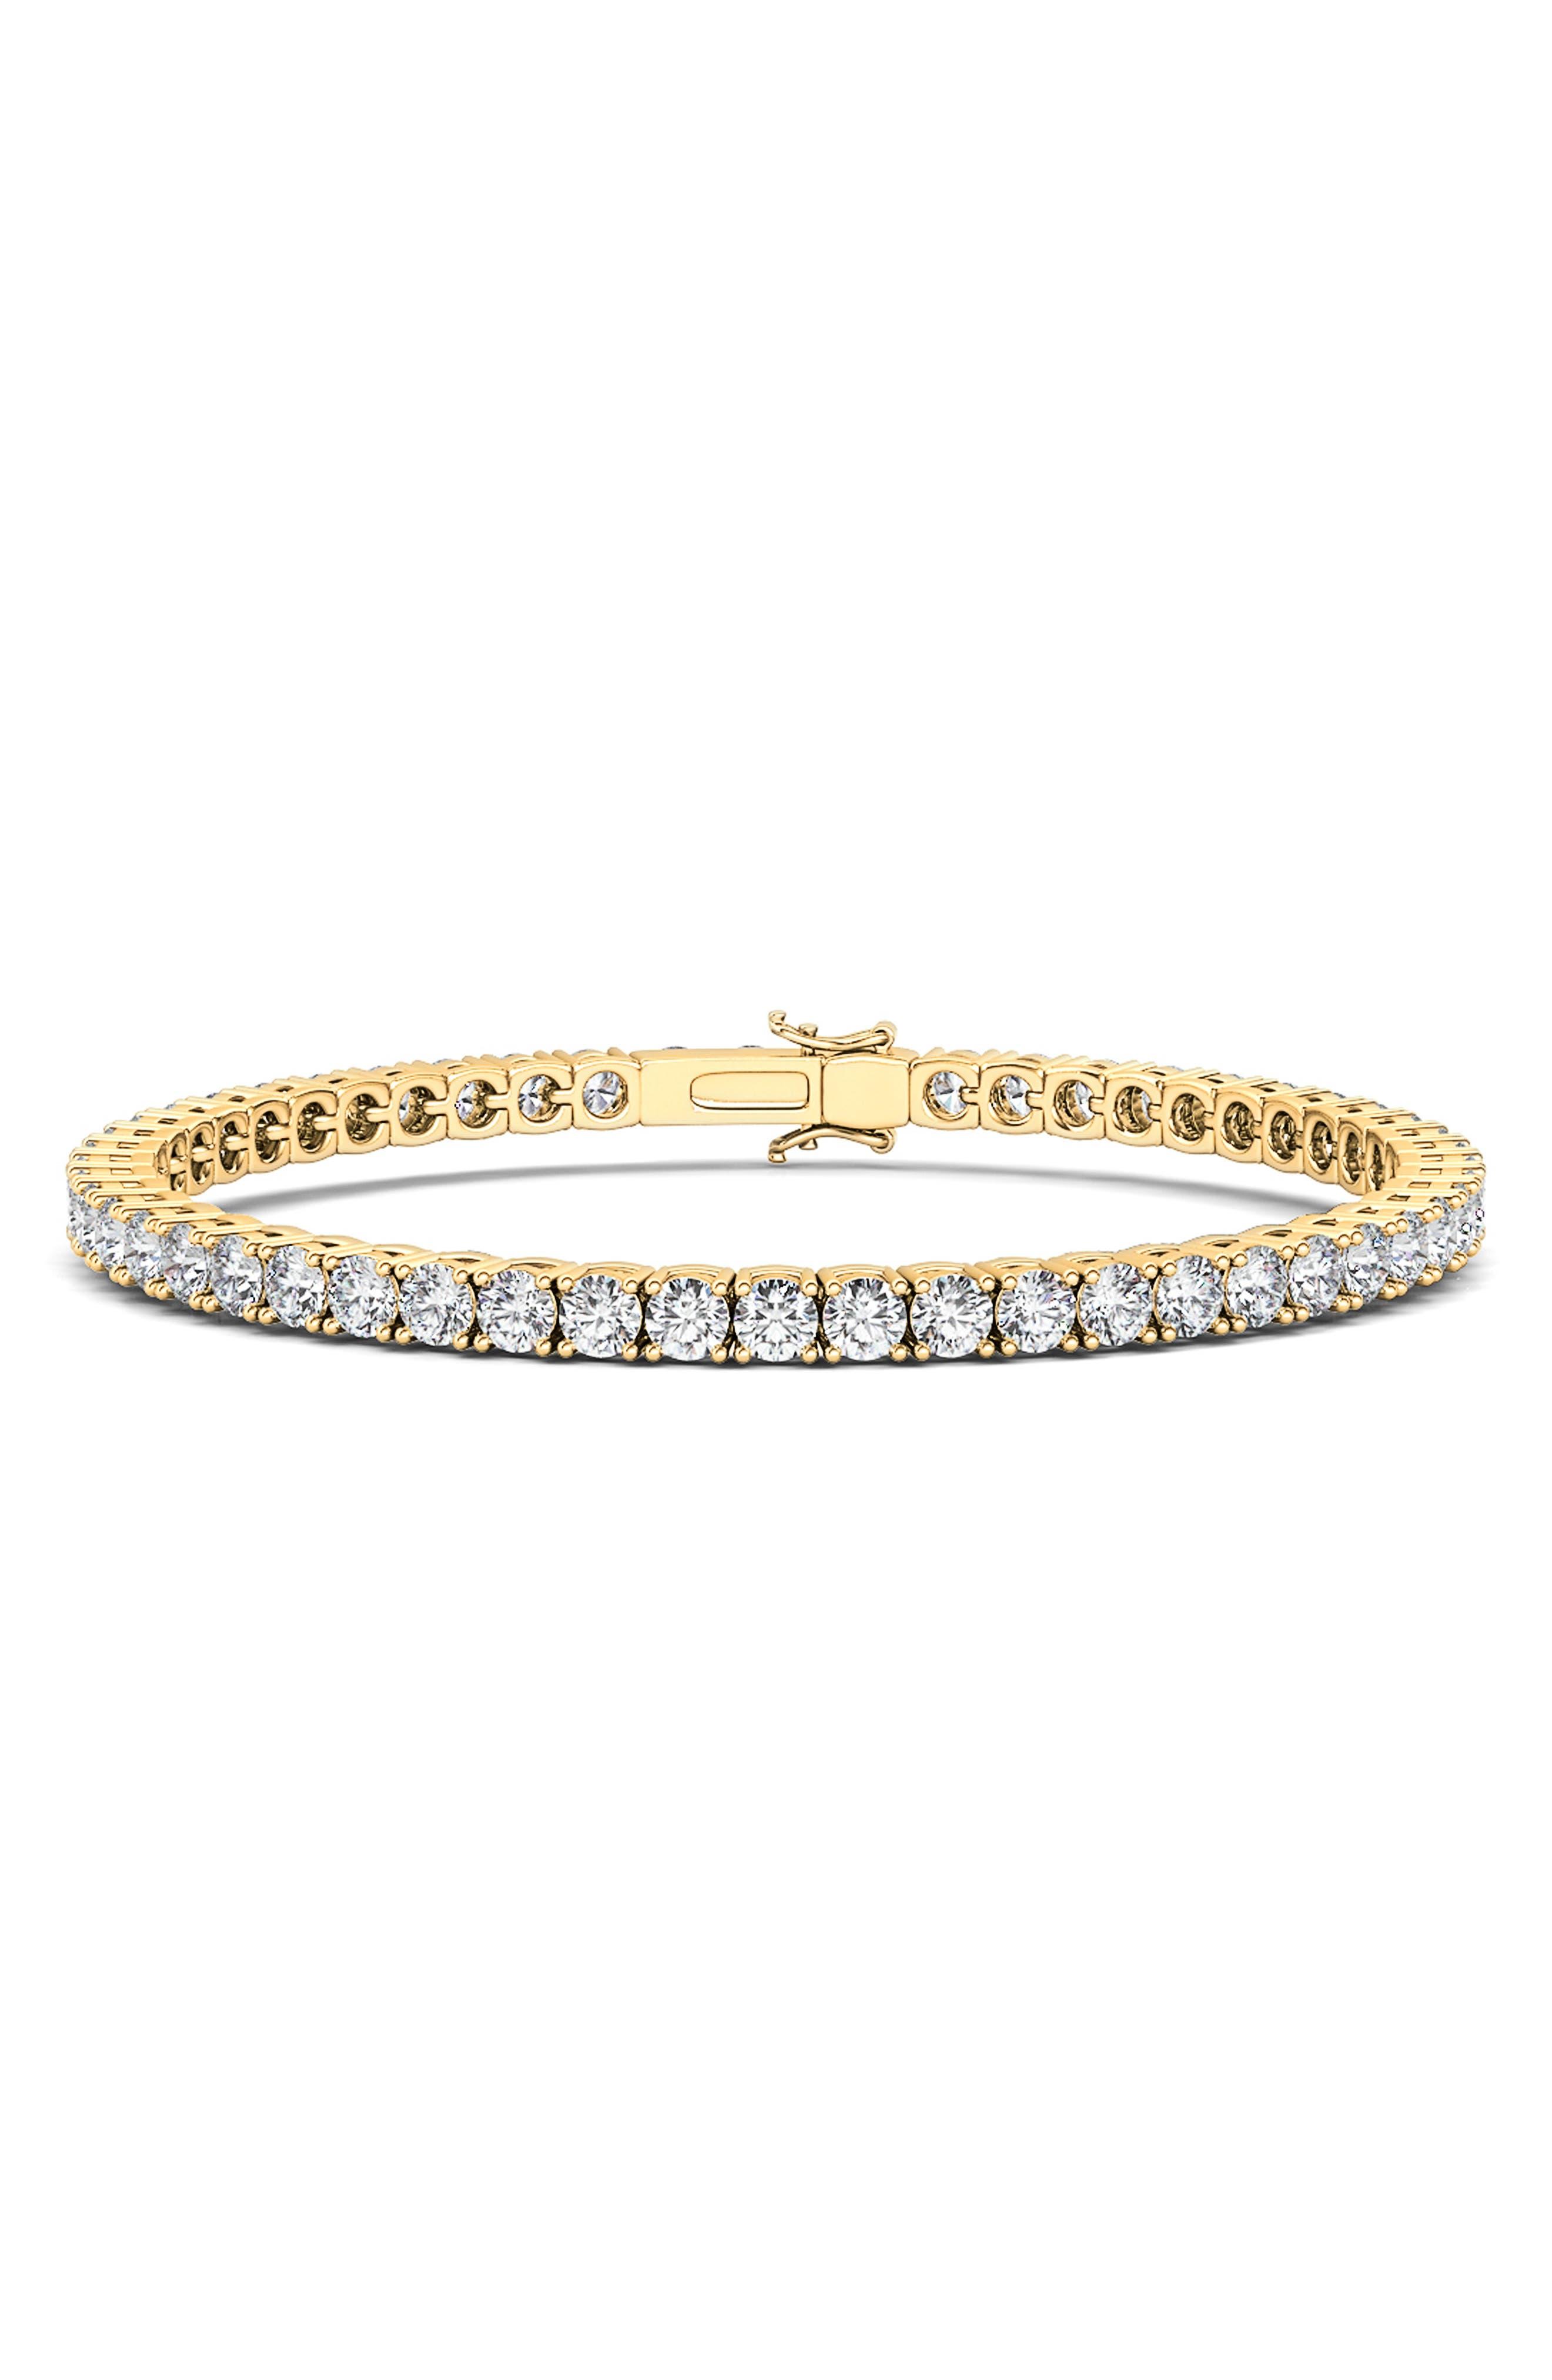 4-Prong 3Ct Lab Created Diamond 14K Gold Tennis Bracelet